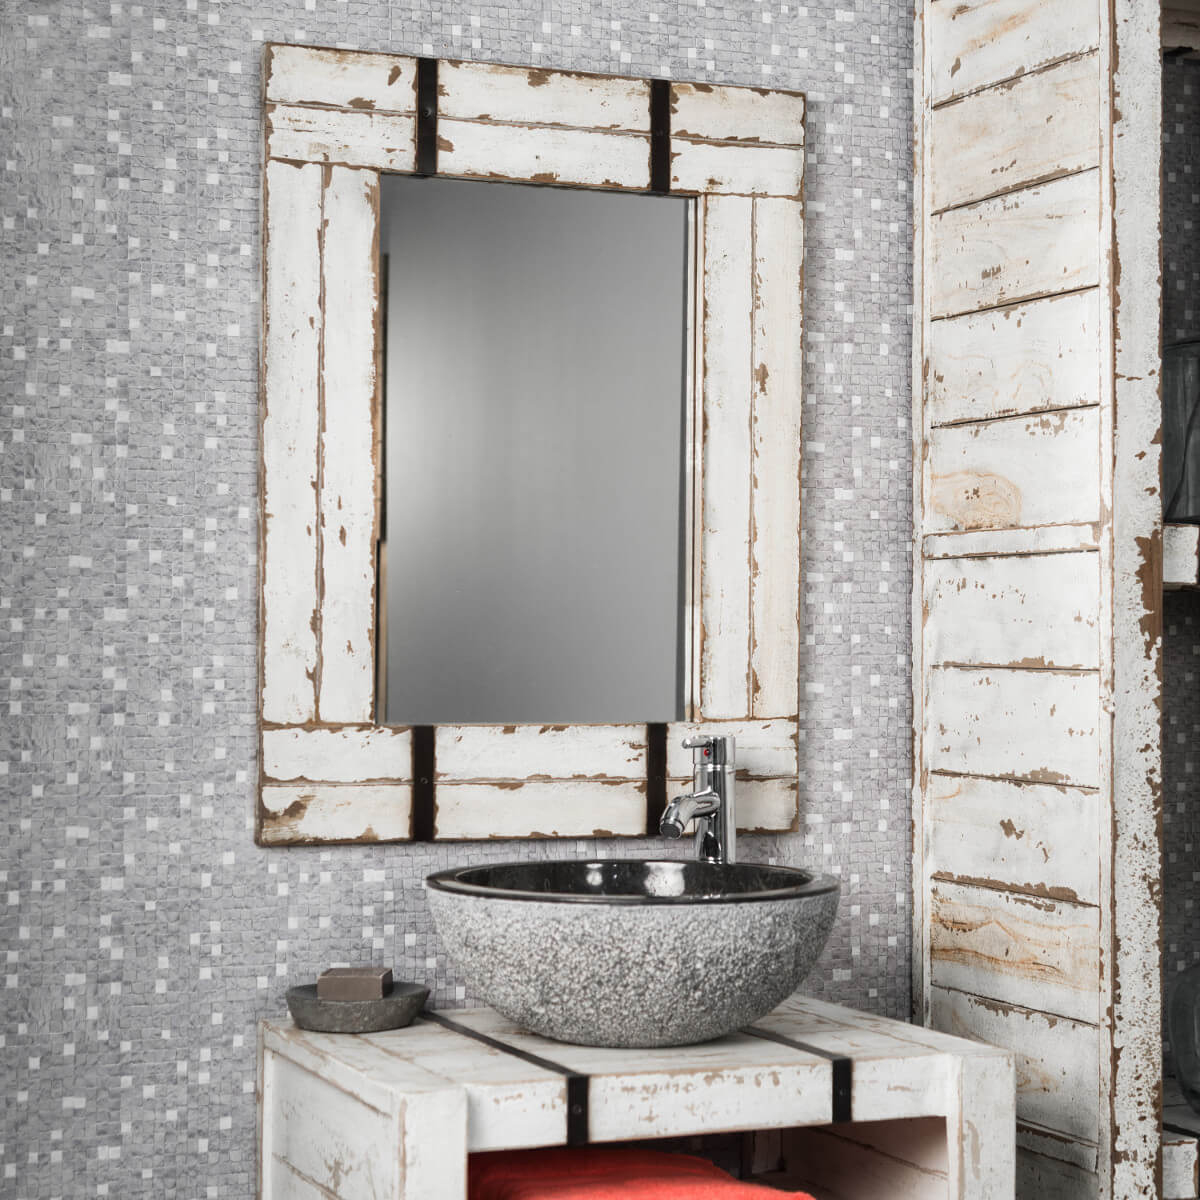 Miroir De Salle De Bain En Mindi 60X80 Loft Blanc dedans Mirroir Salle De Bain